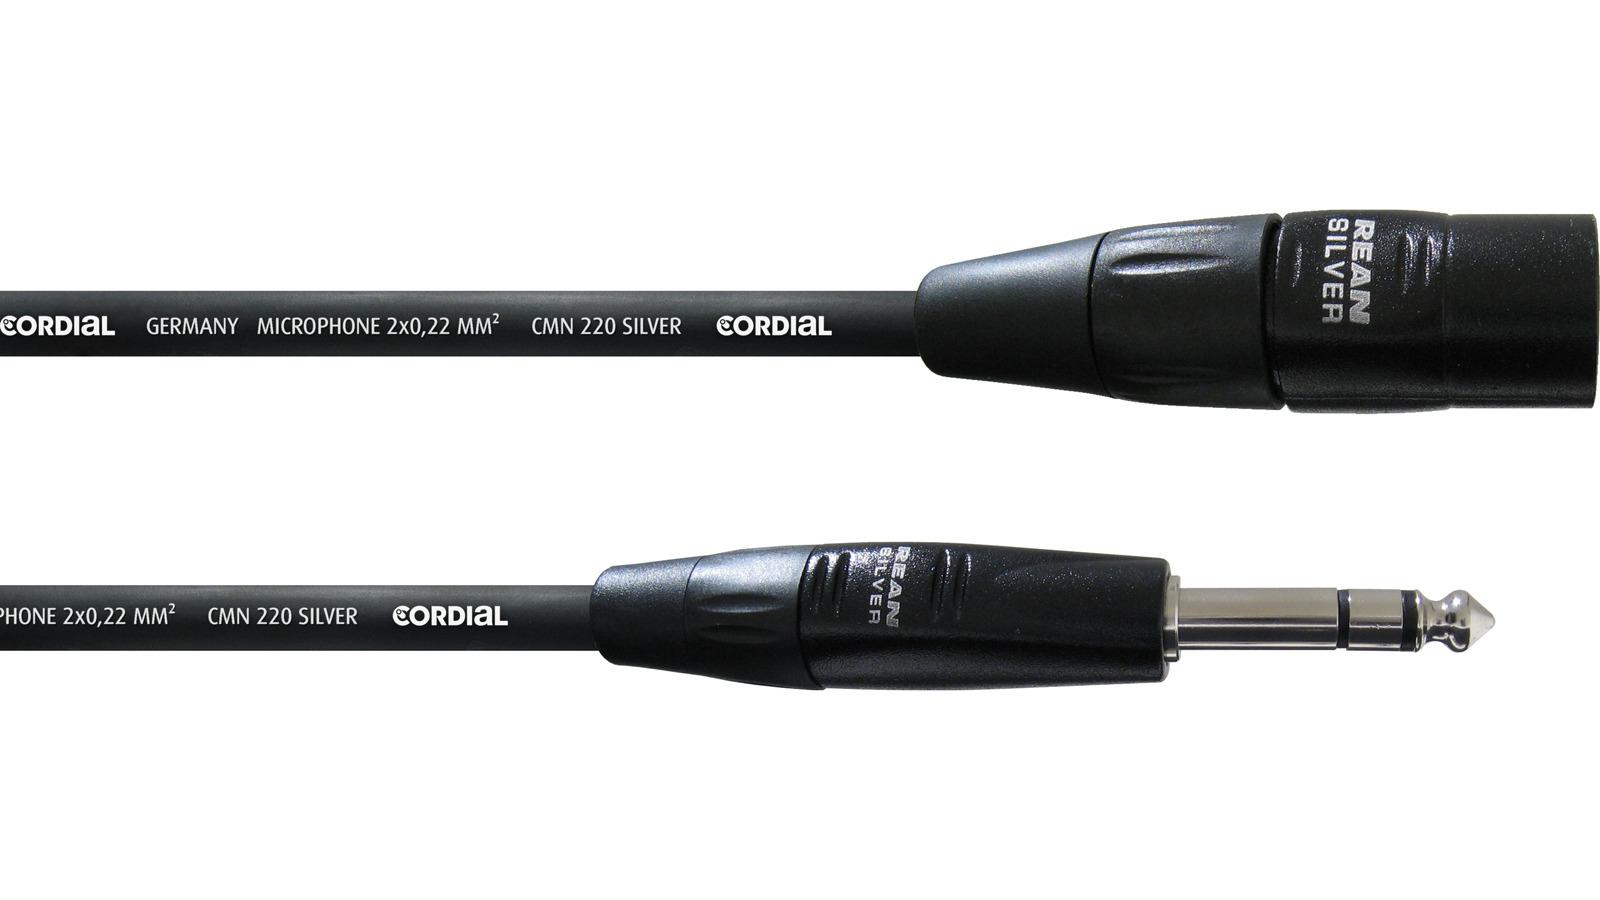 Cordial symmetrisches Kabel  0,6 m CIM 0,6 MV